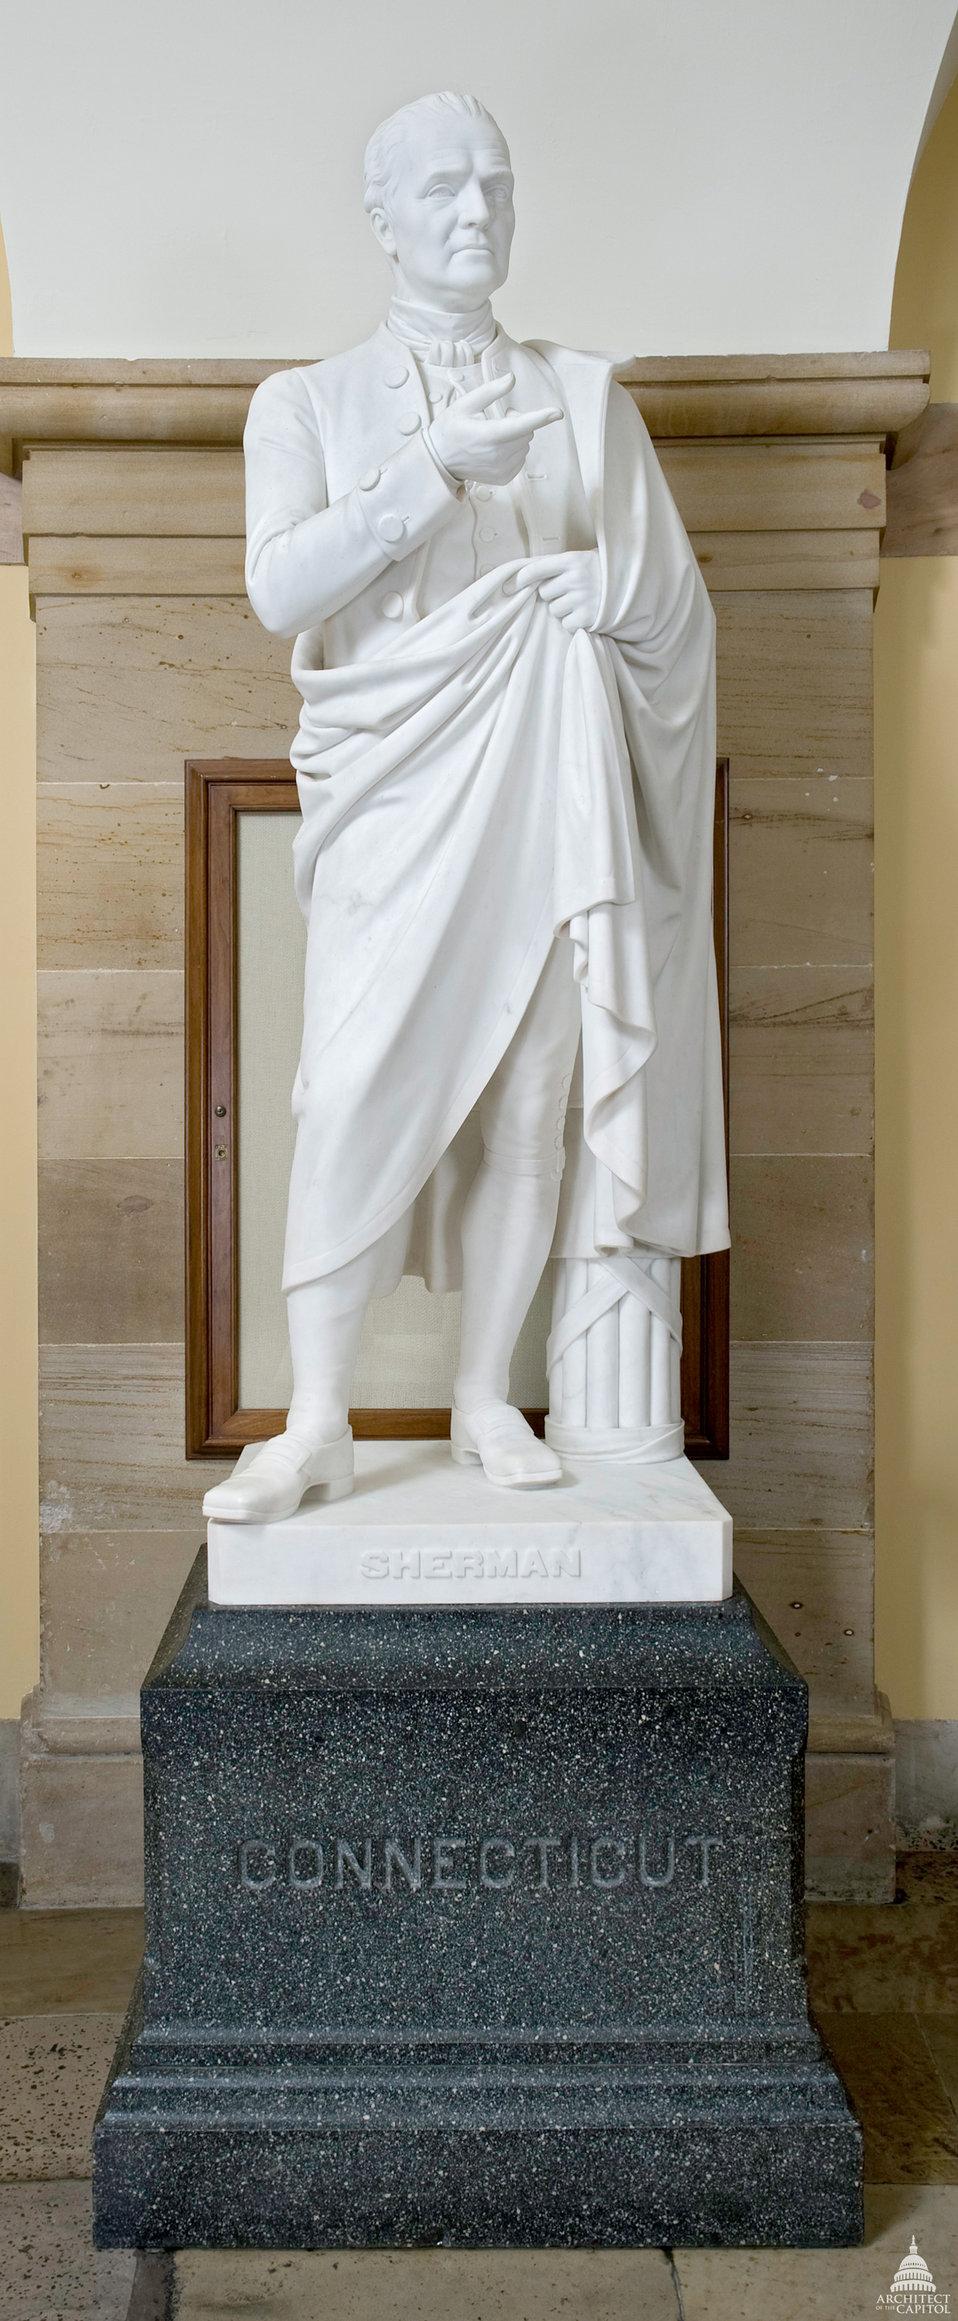 Roger Sherman Statue